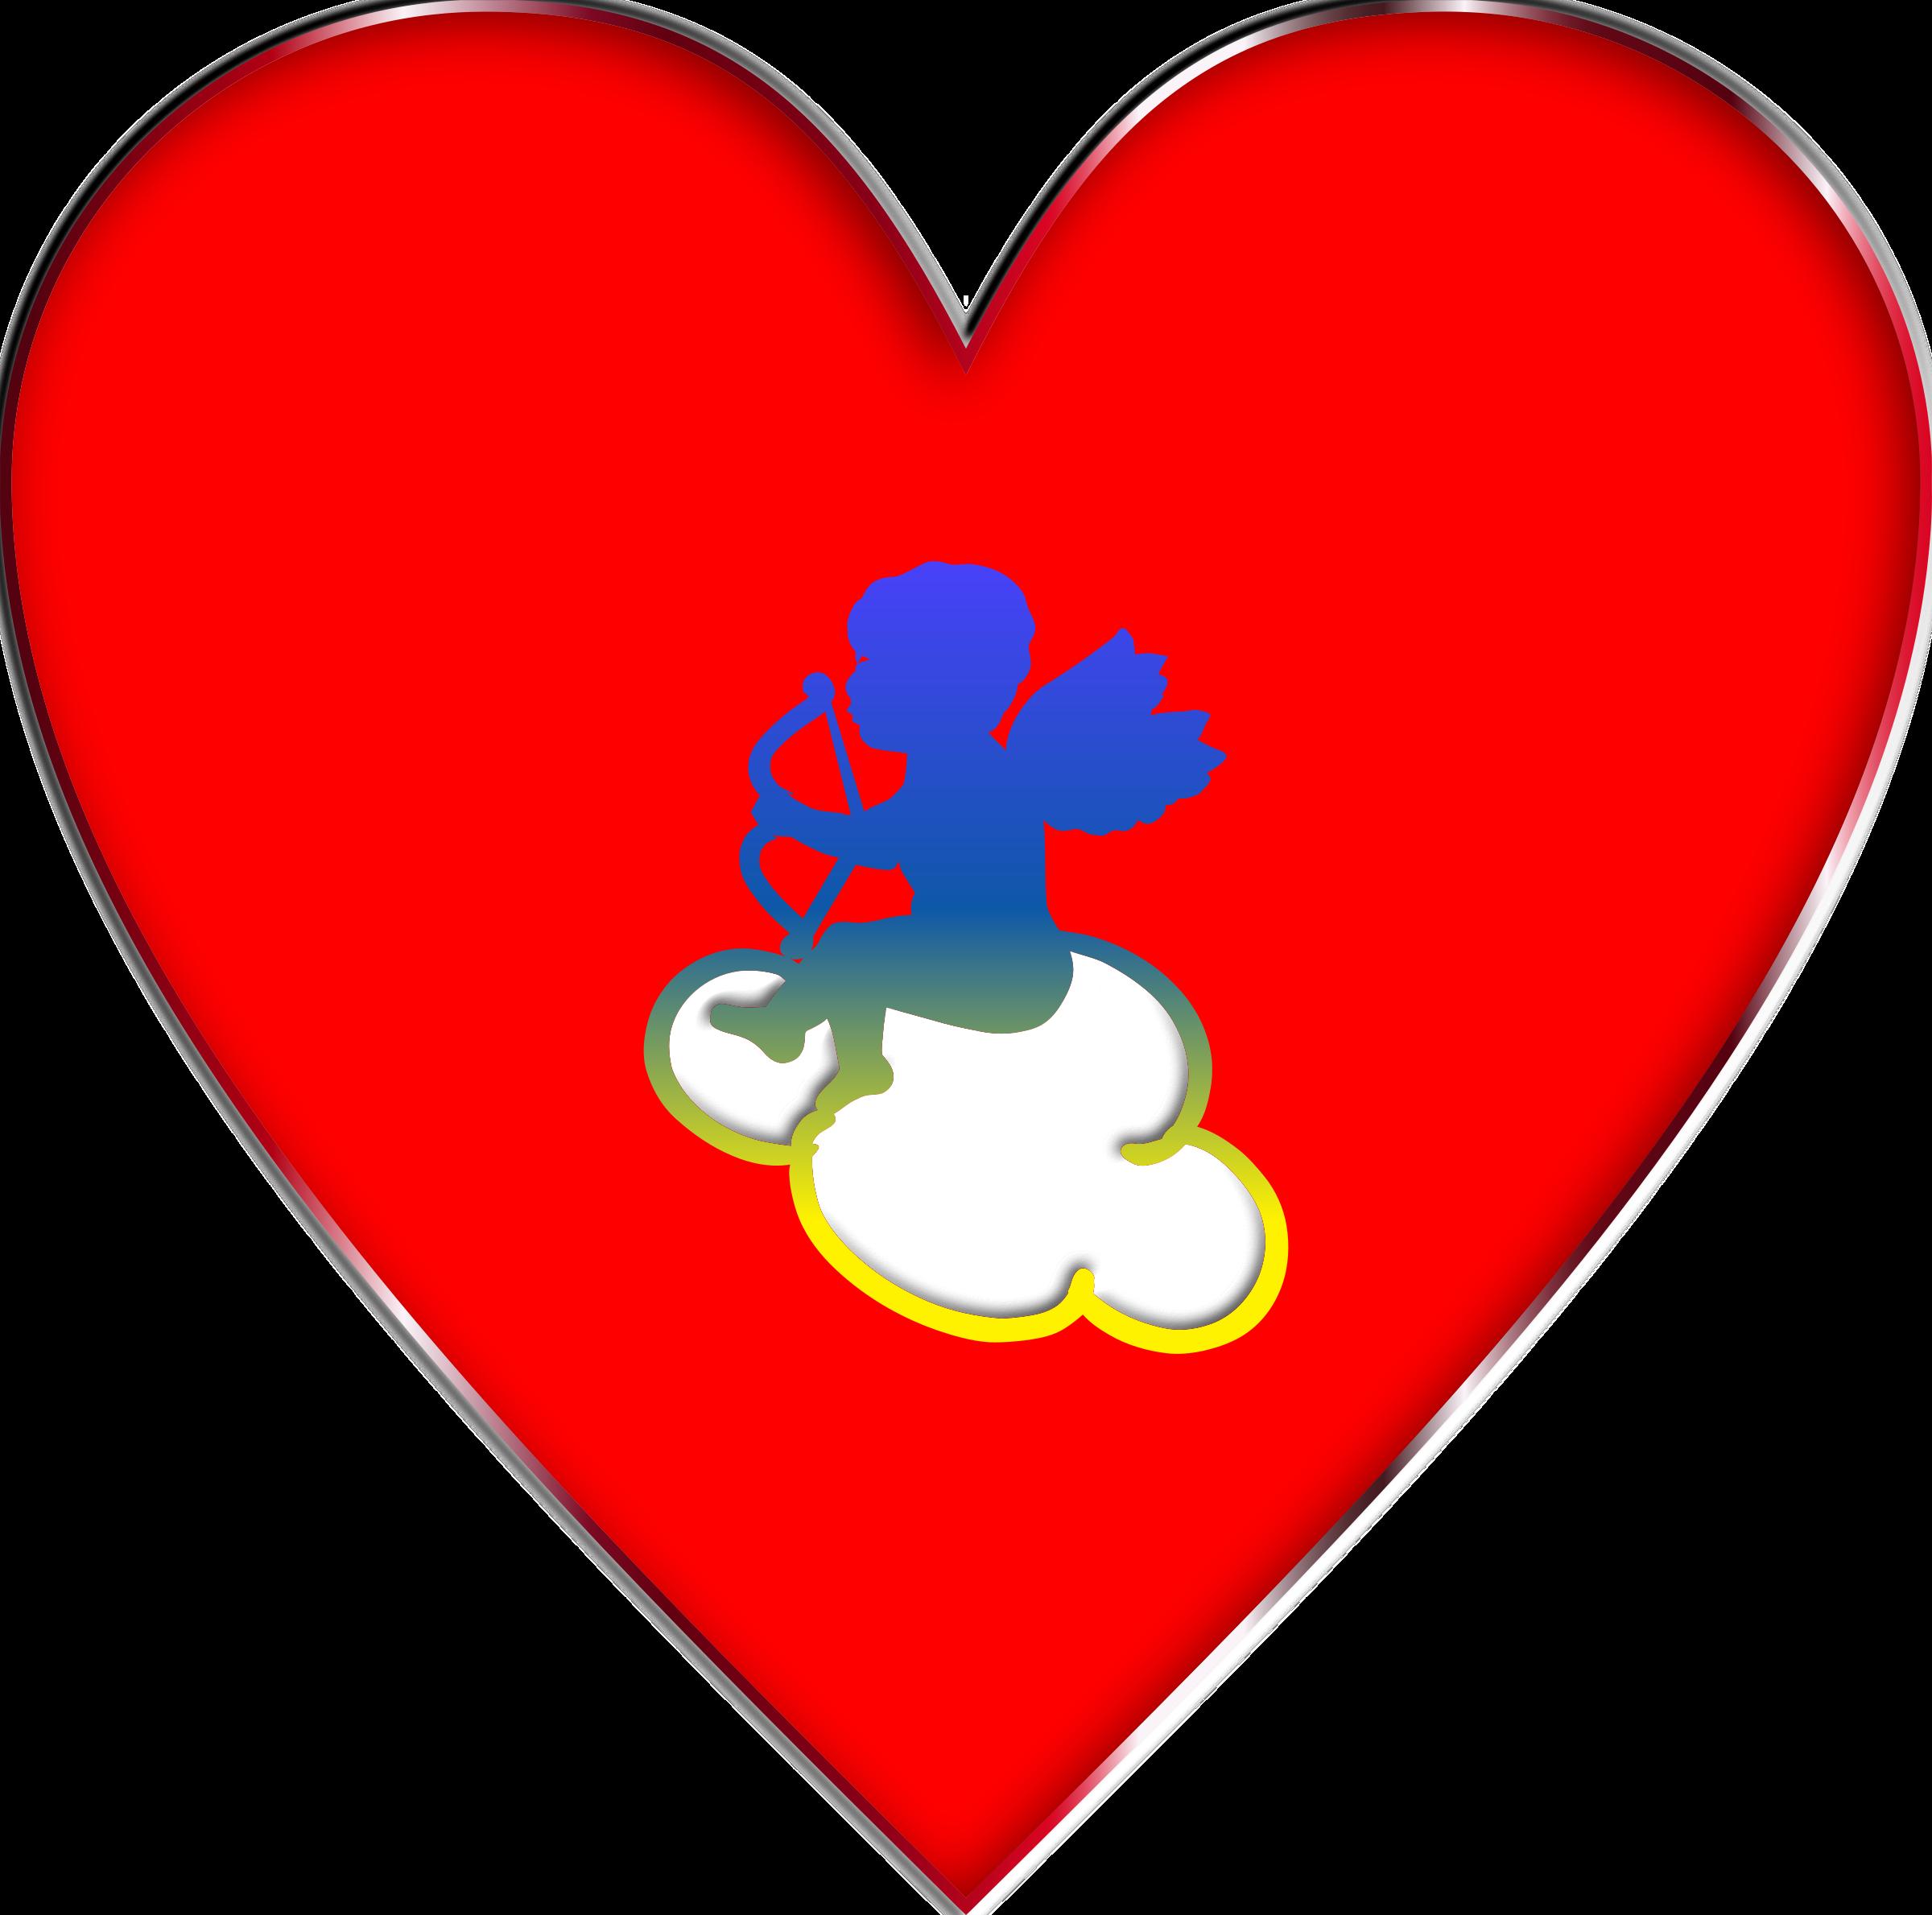 clipart stock Cloud clipart heart. Cupid enhanced big image.